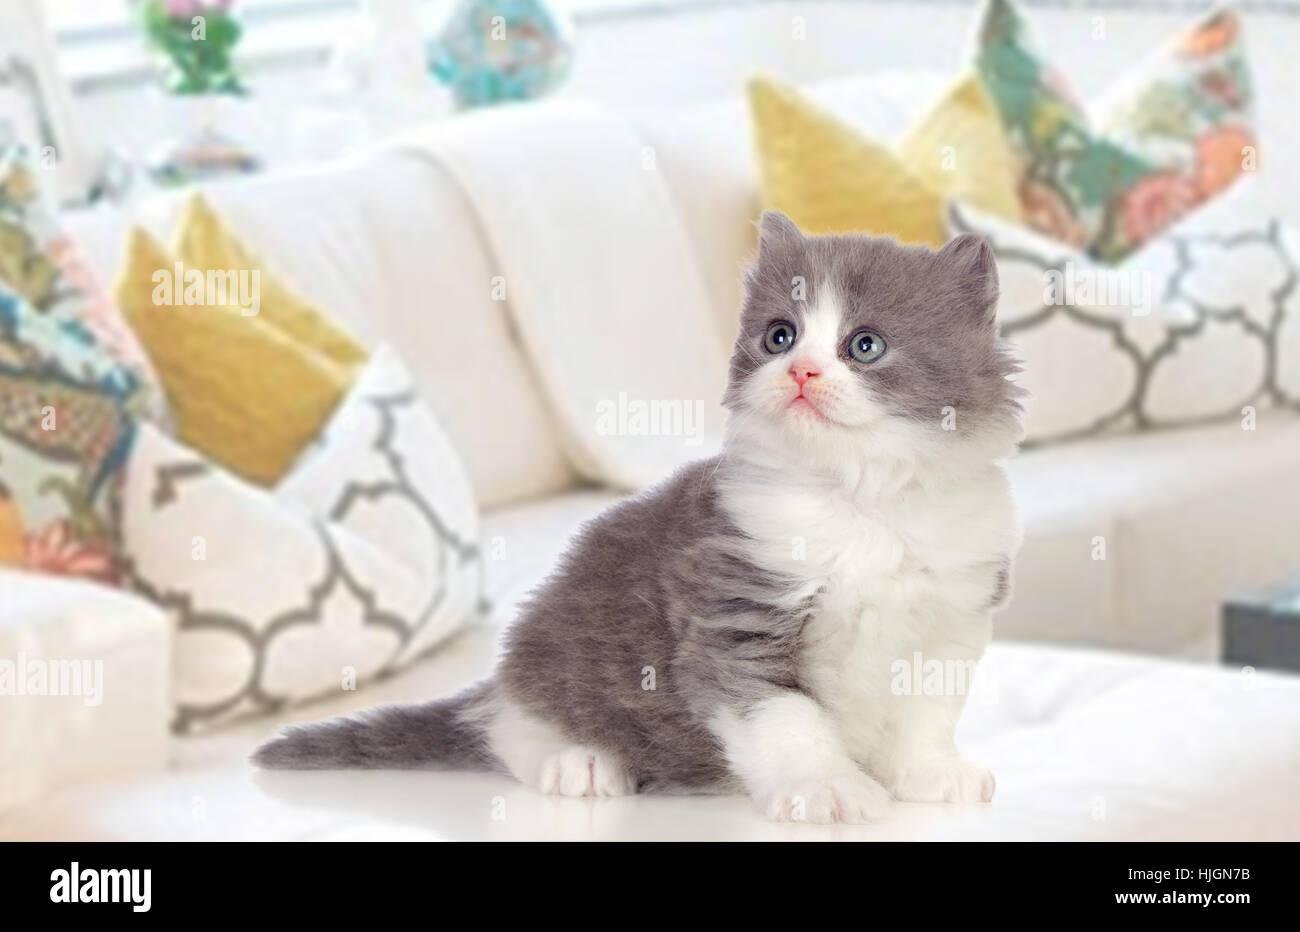 Sofa Cat Baby Kitten Homey Domestic Angora Persian Pussycat